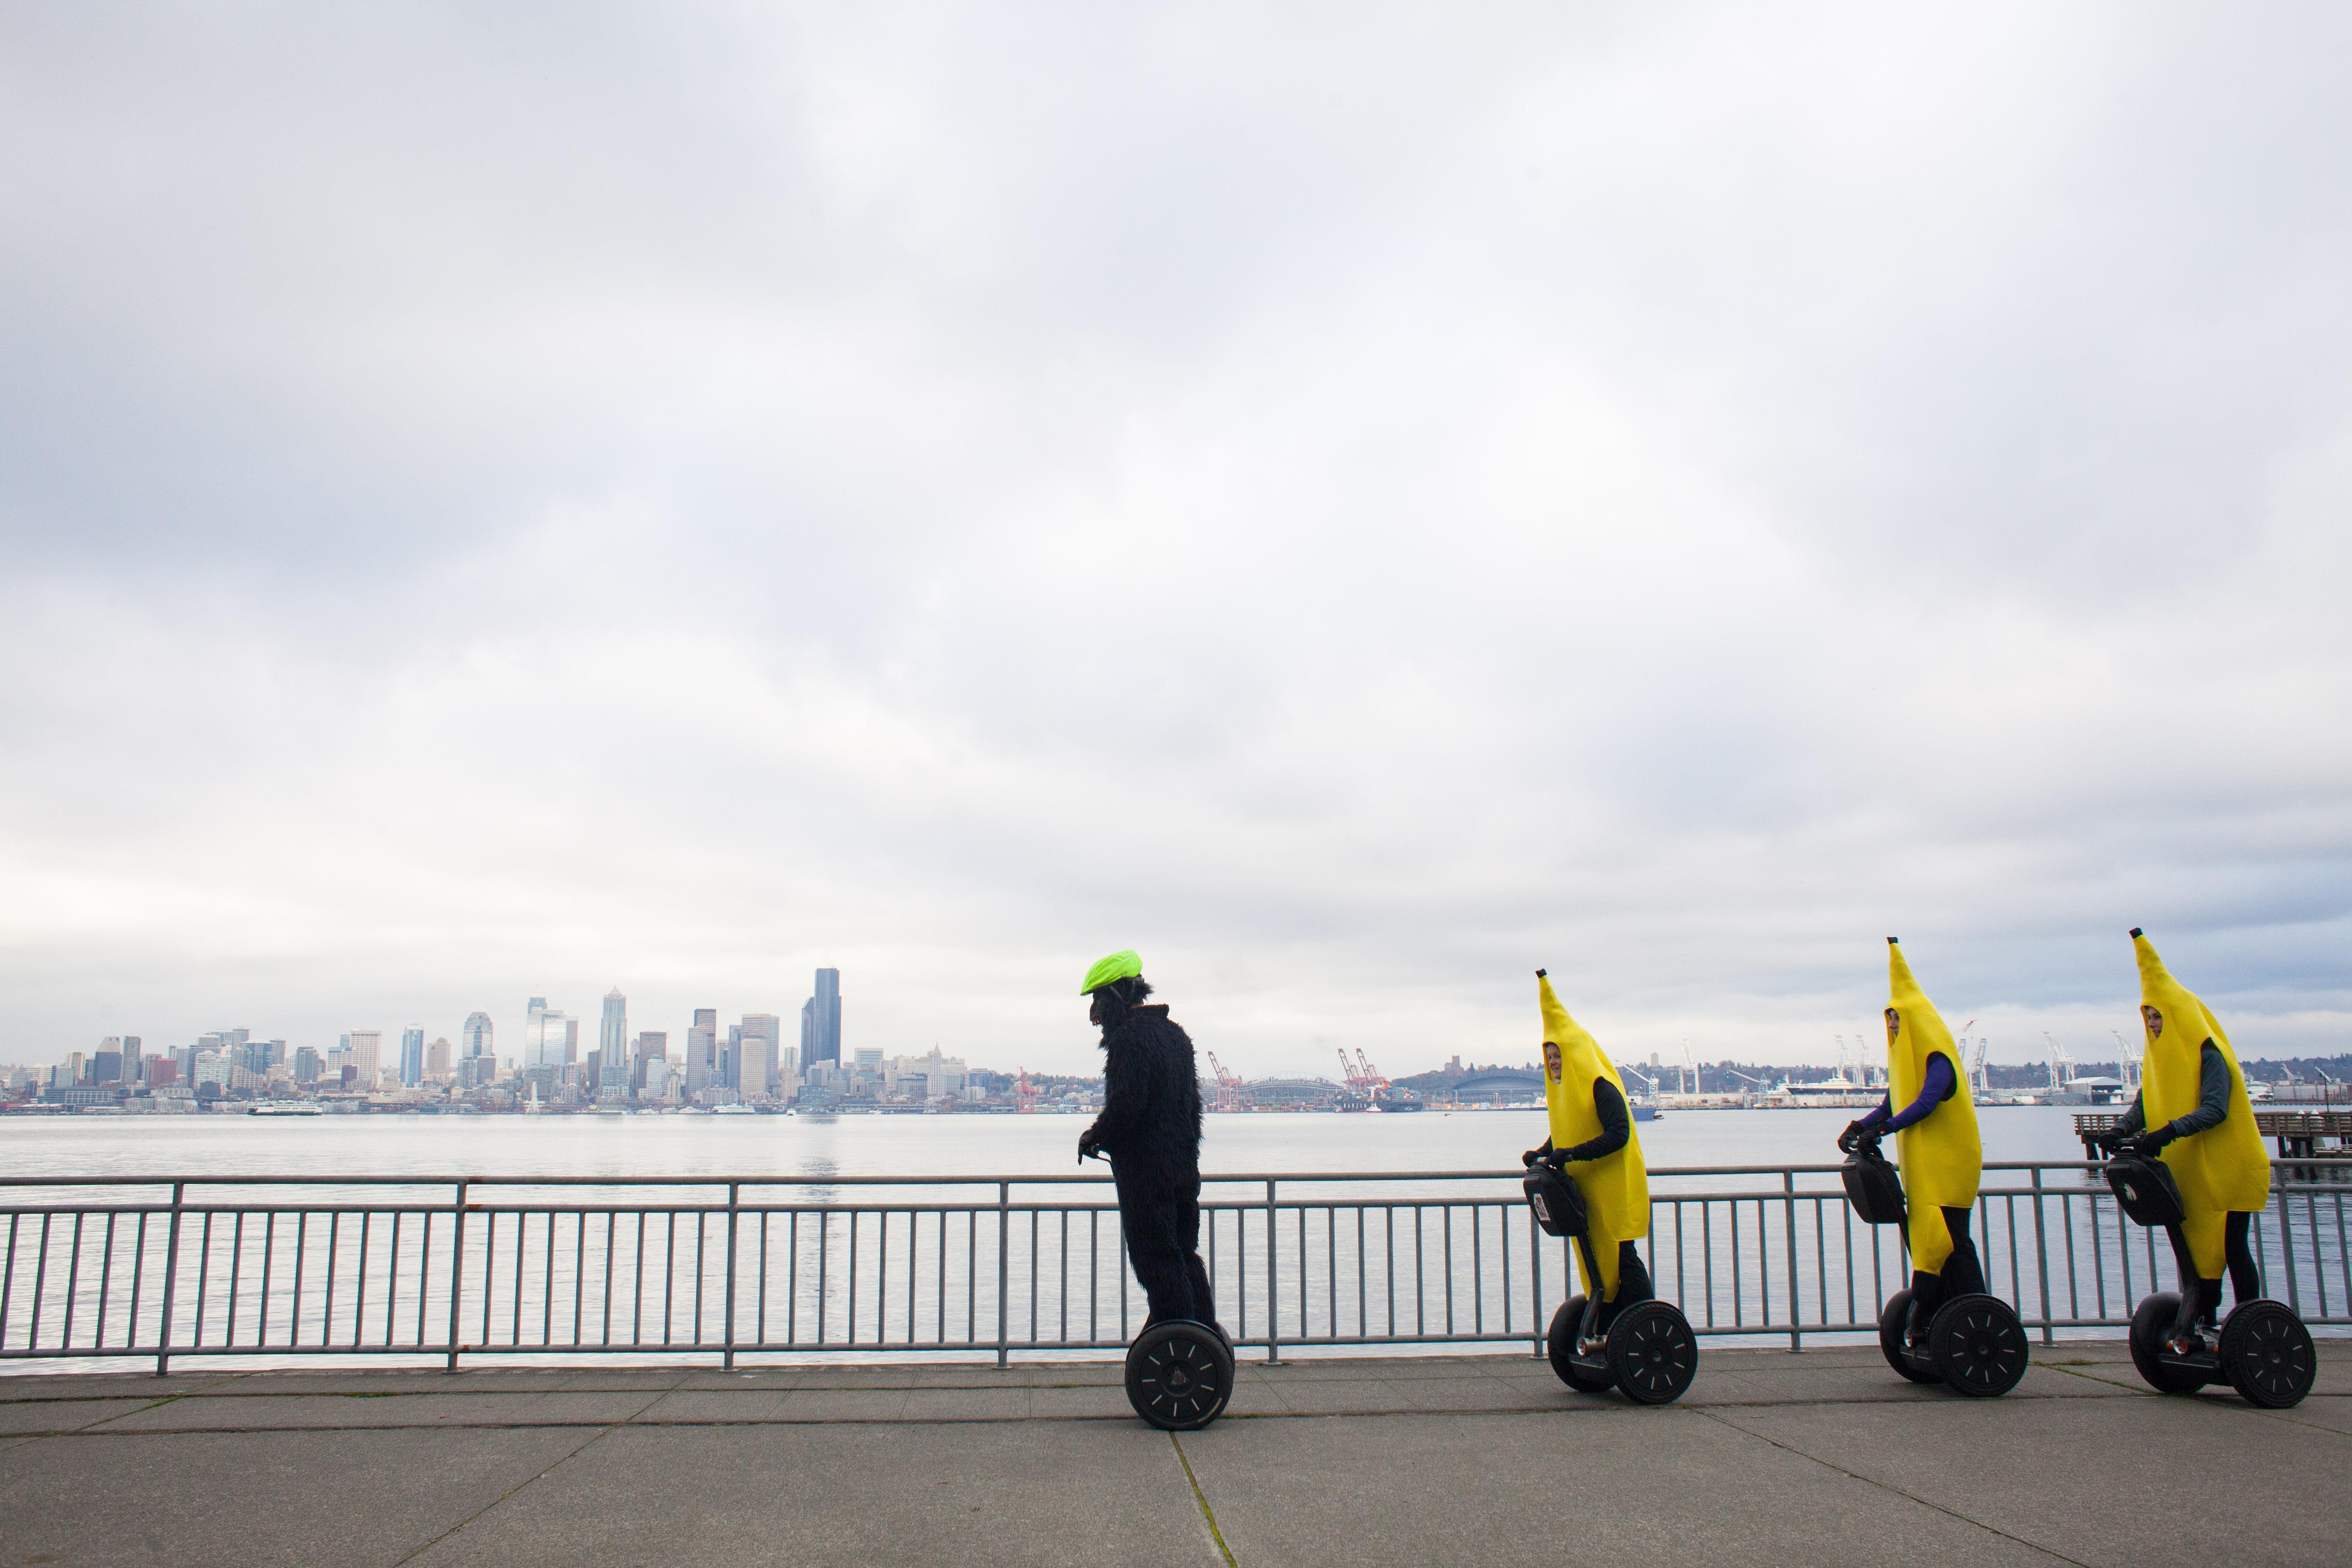 2014-10-15-bananas1.jpg